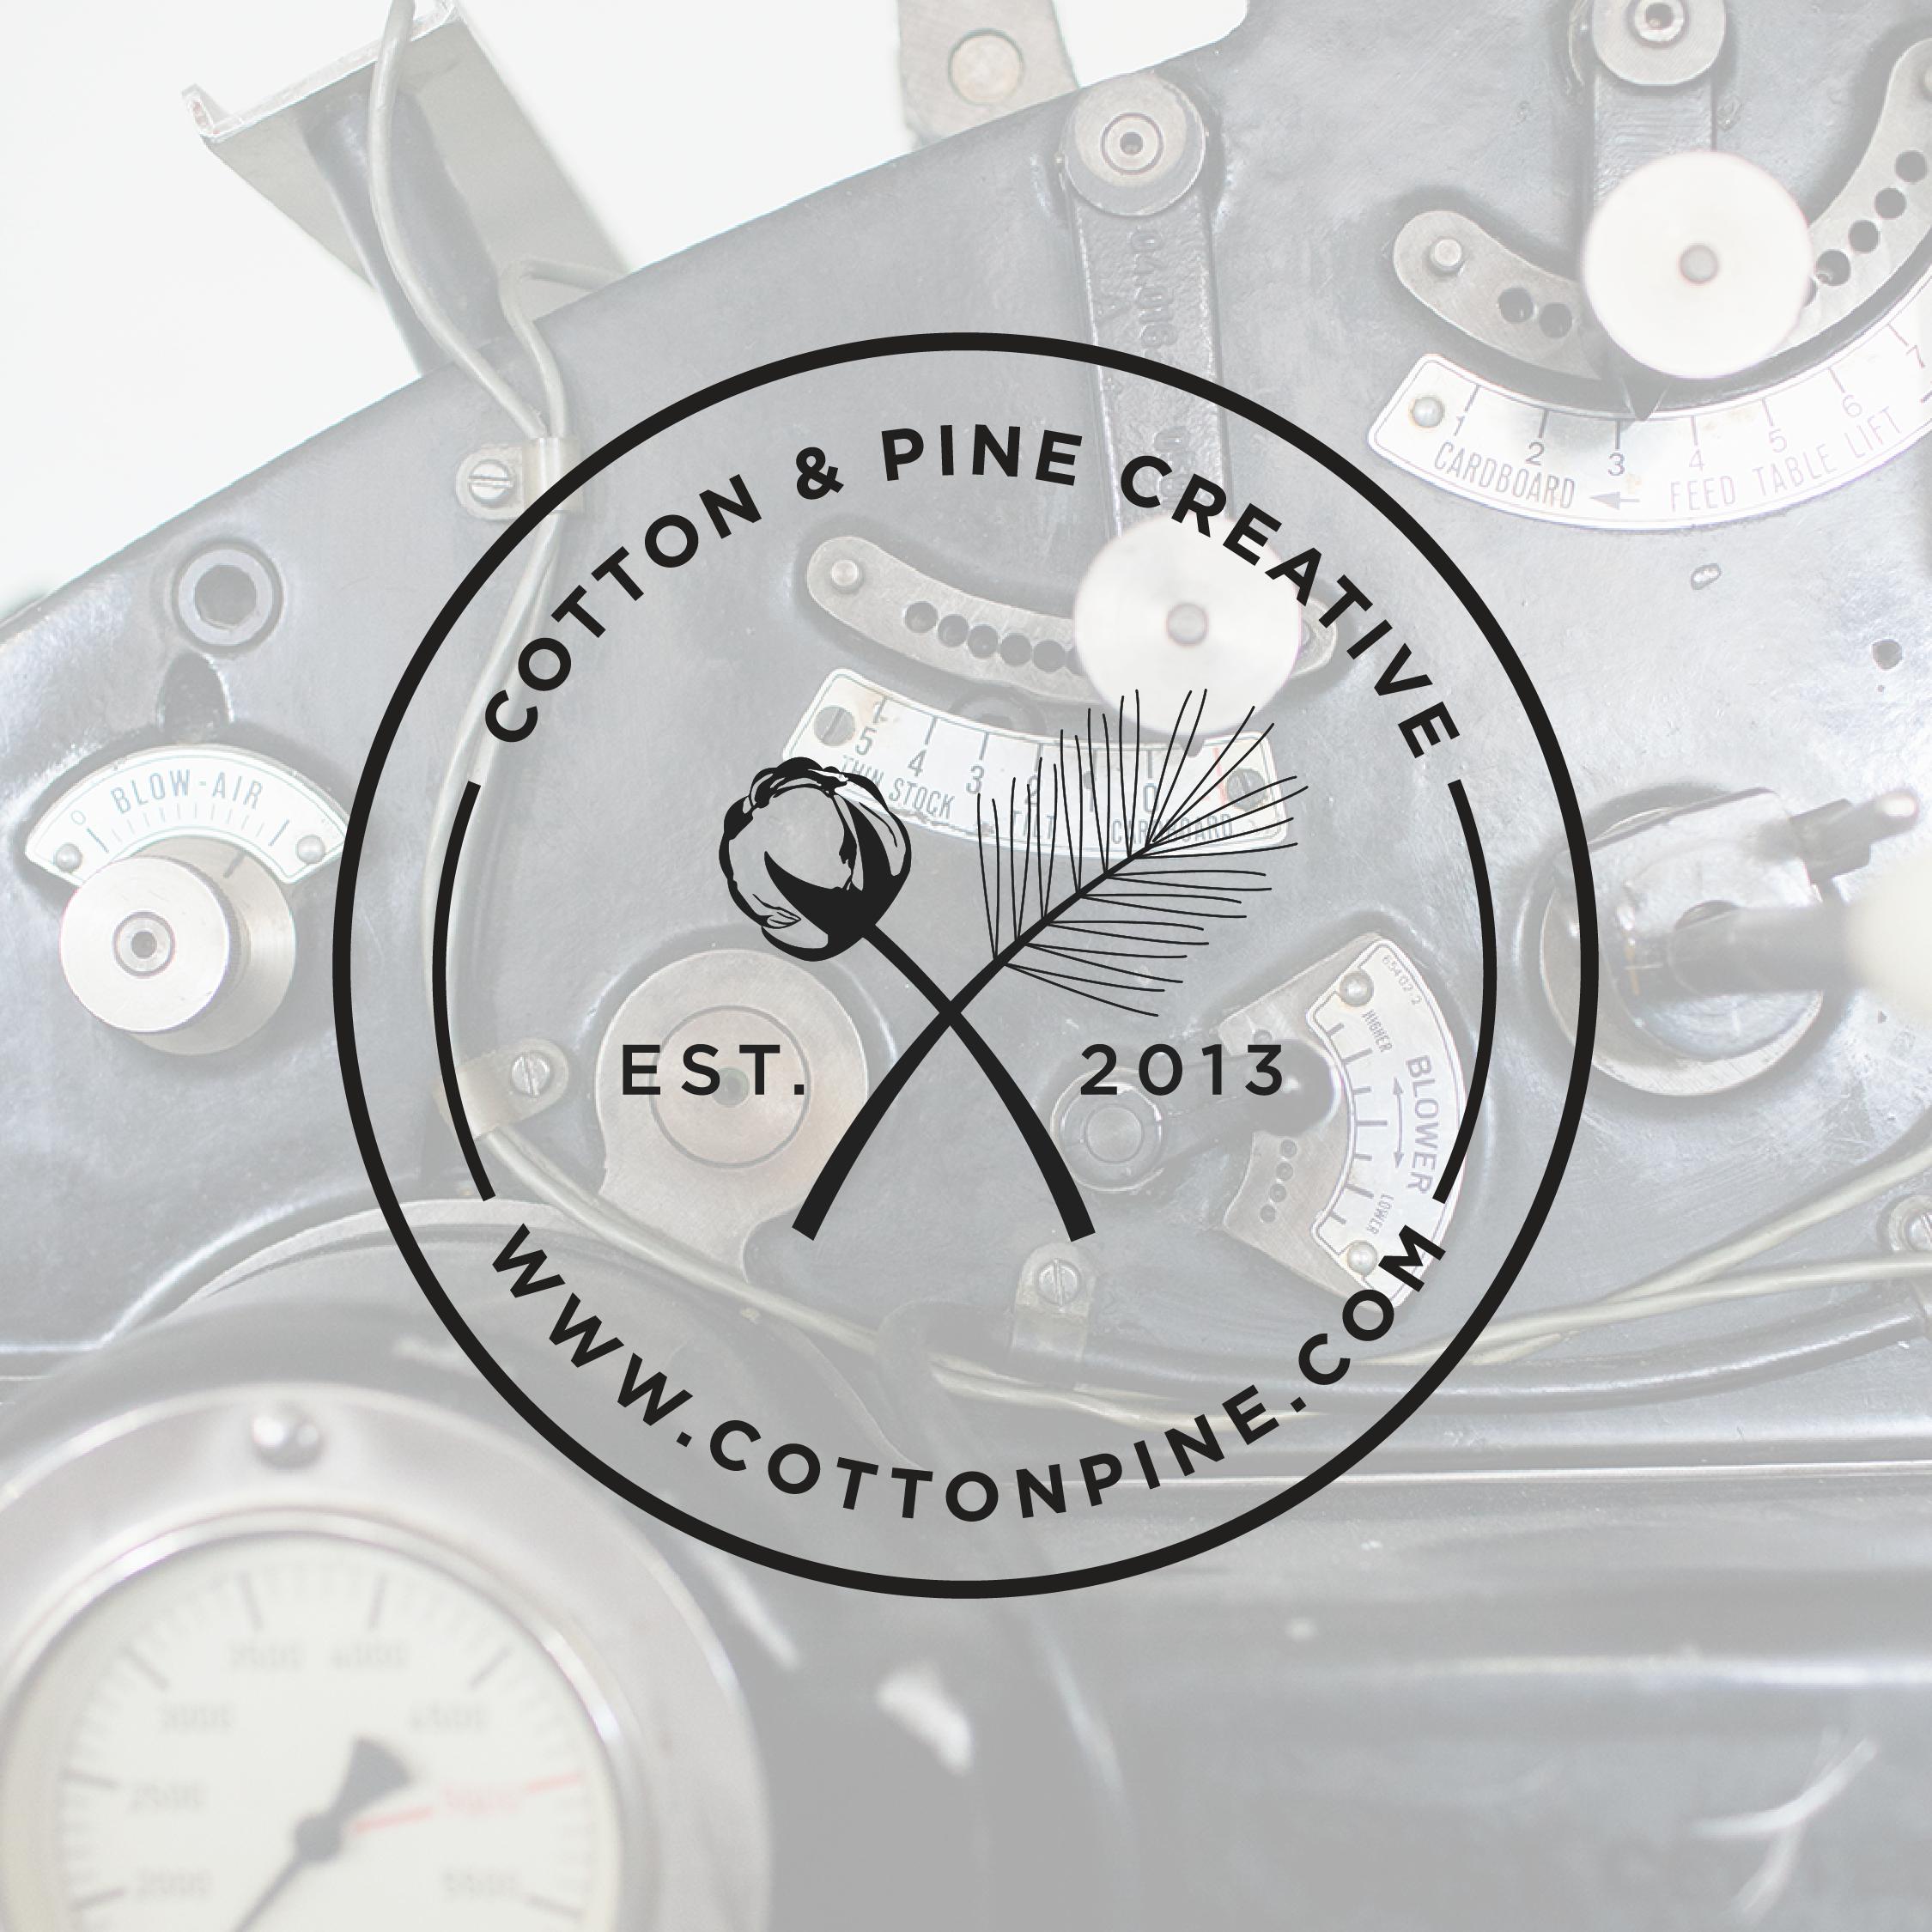 Cotton & Pine